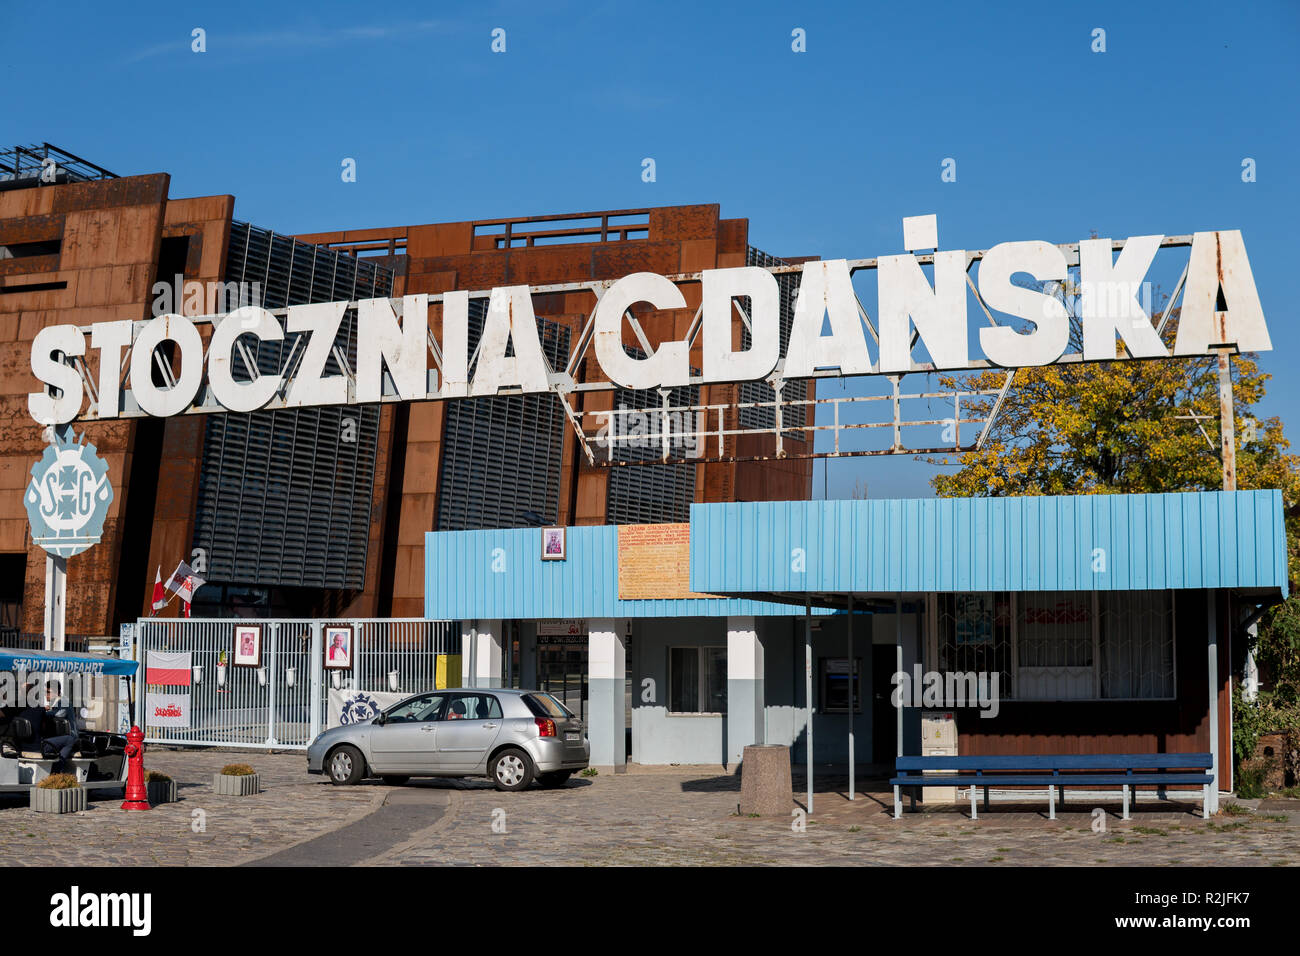 October 2018, Gdansk, Poland: Historical gate numer 2, entrance to Gdansk Shipyard where in August 1980 massive strike has begun and beginning of Soli - Stock Image